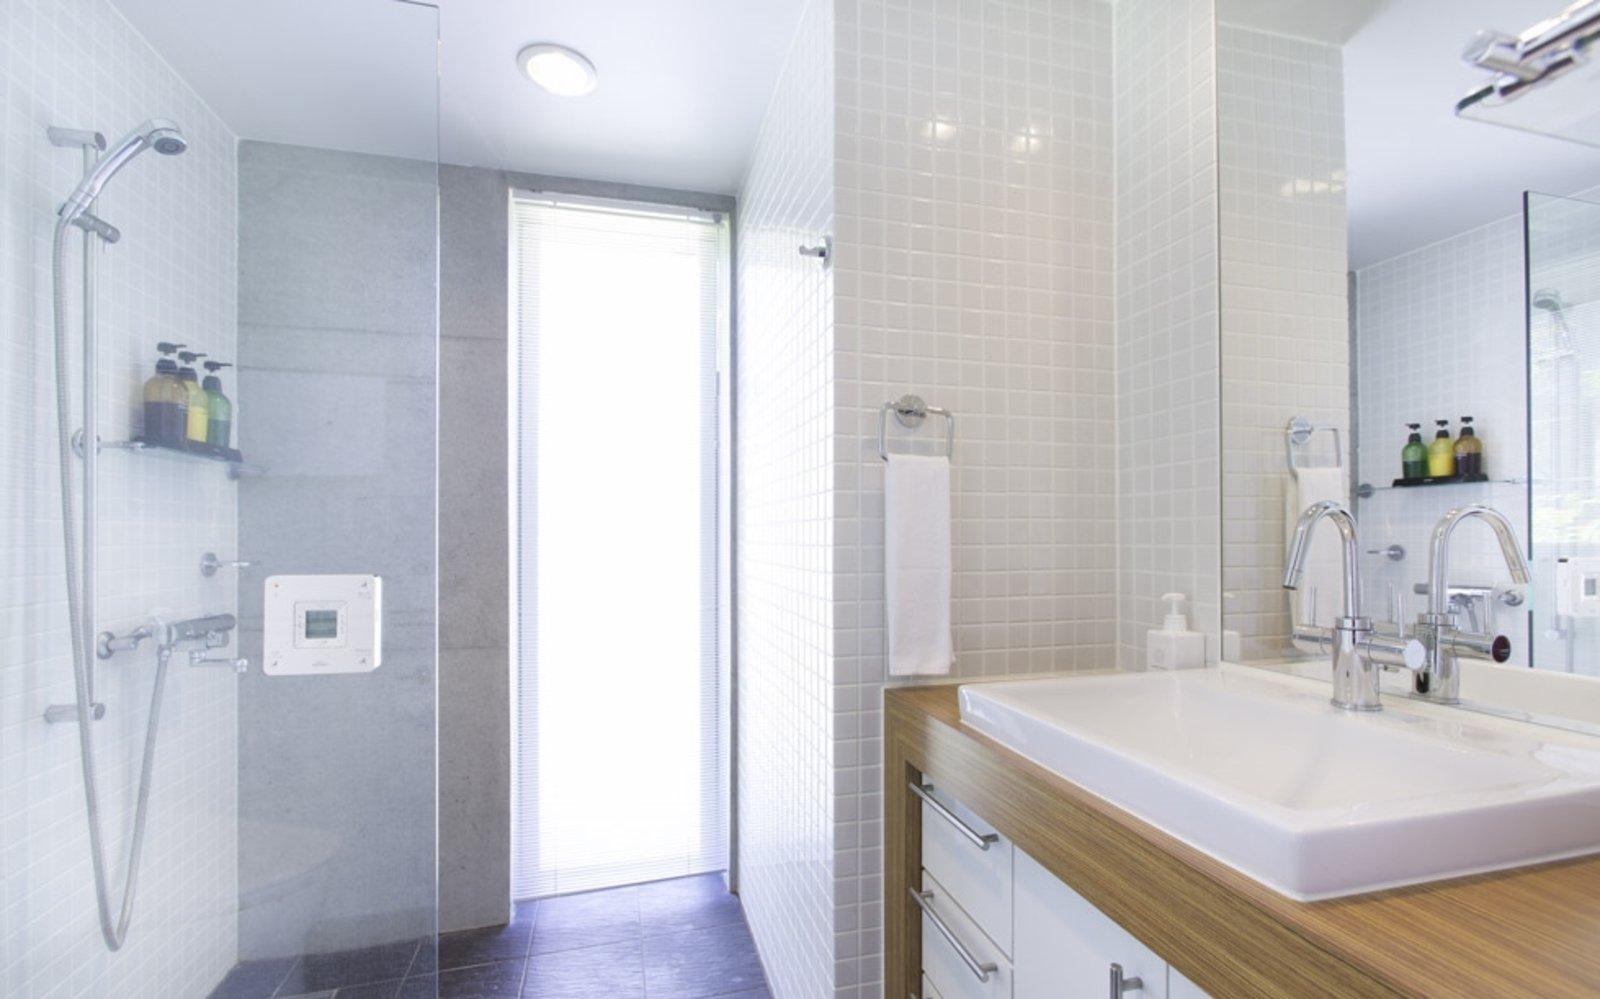 Kon m 3bdr house bathroom large